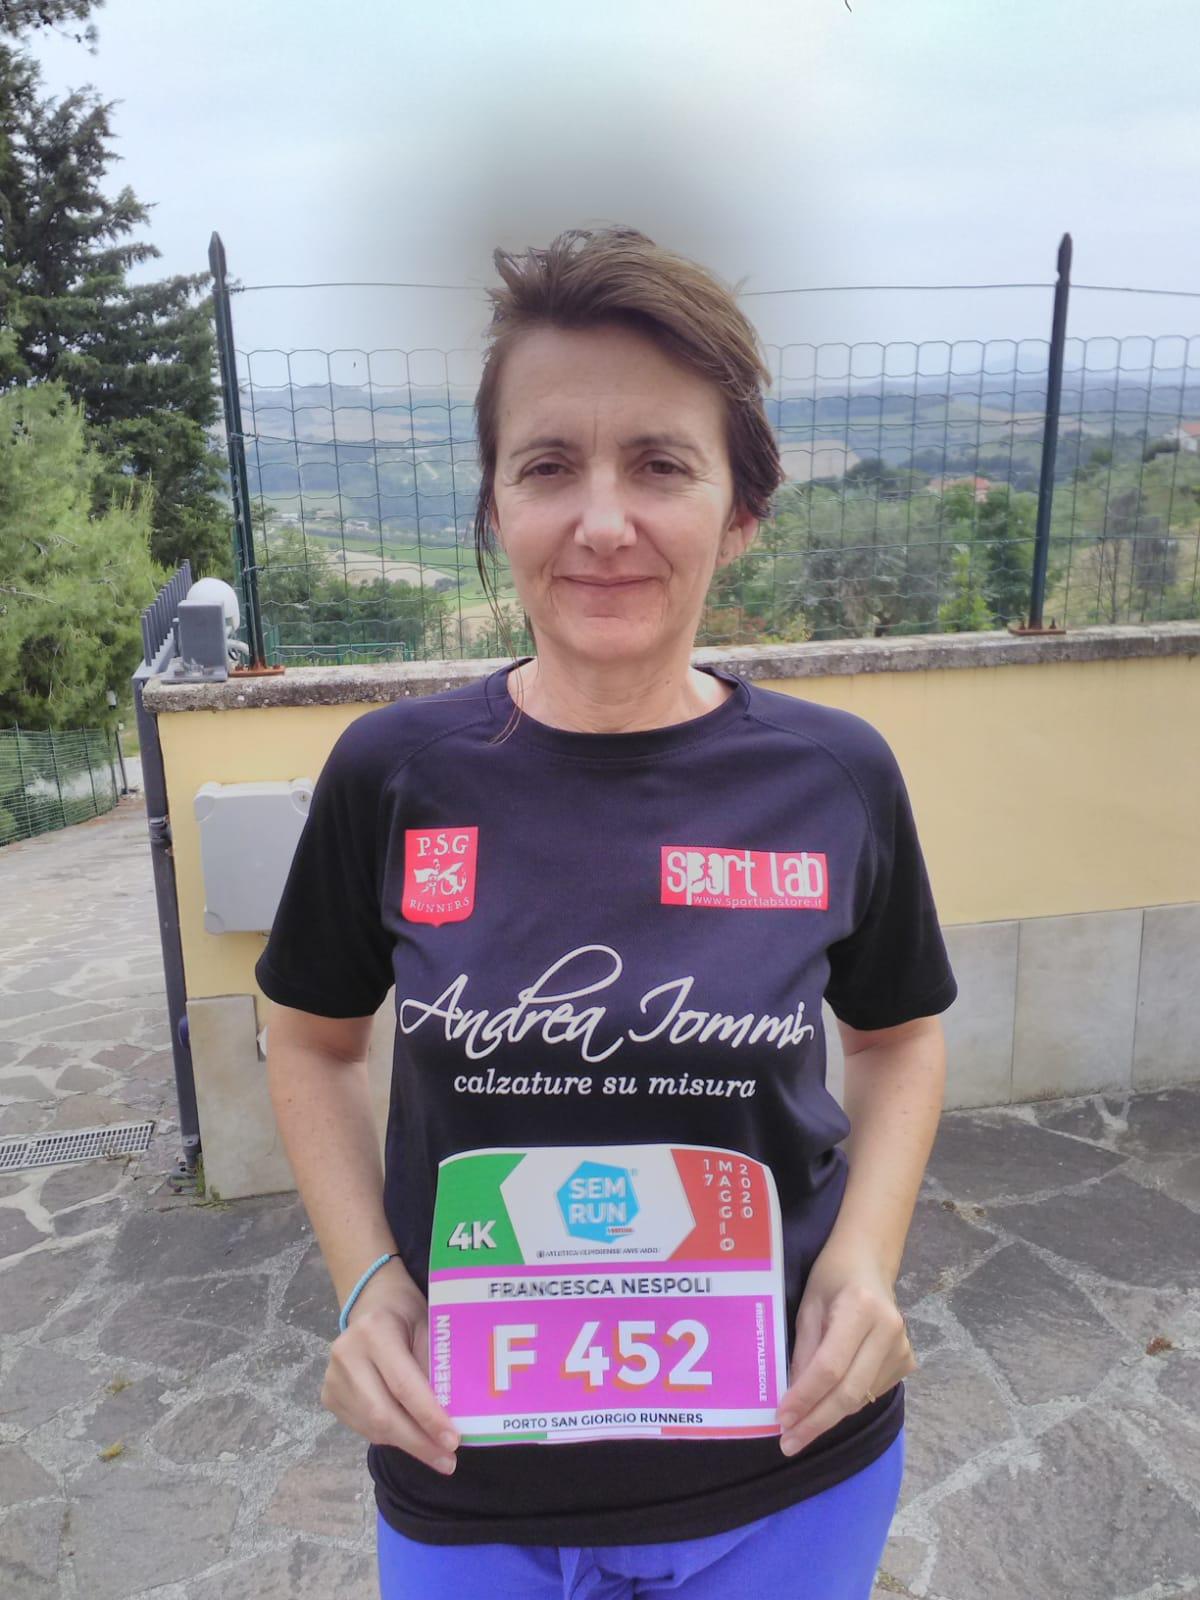 Nespoli Francesca